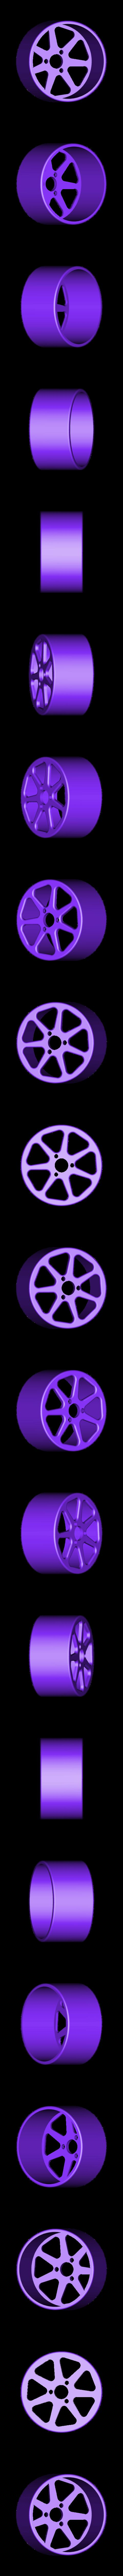 jante_roue_crante.stl Download free STL file 3 RC wheels • 3D printing template, Boxplyer